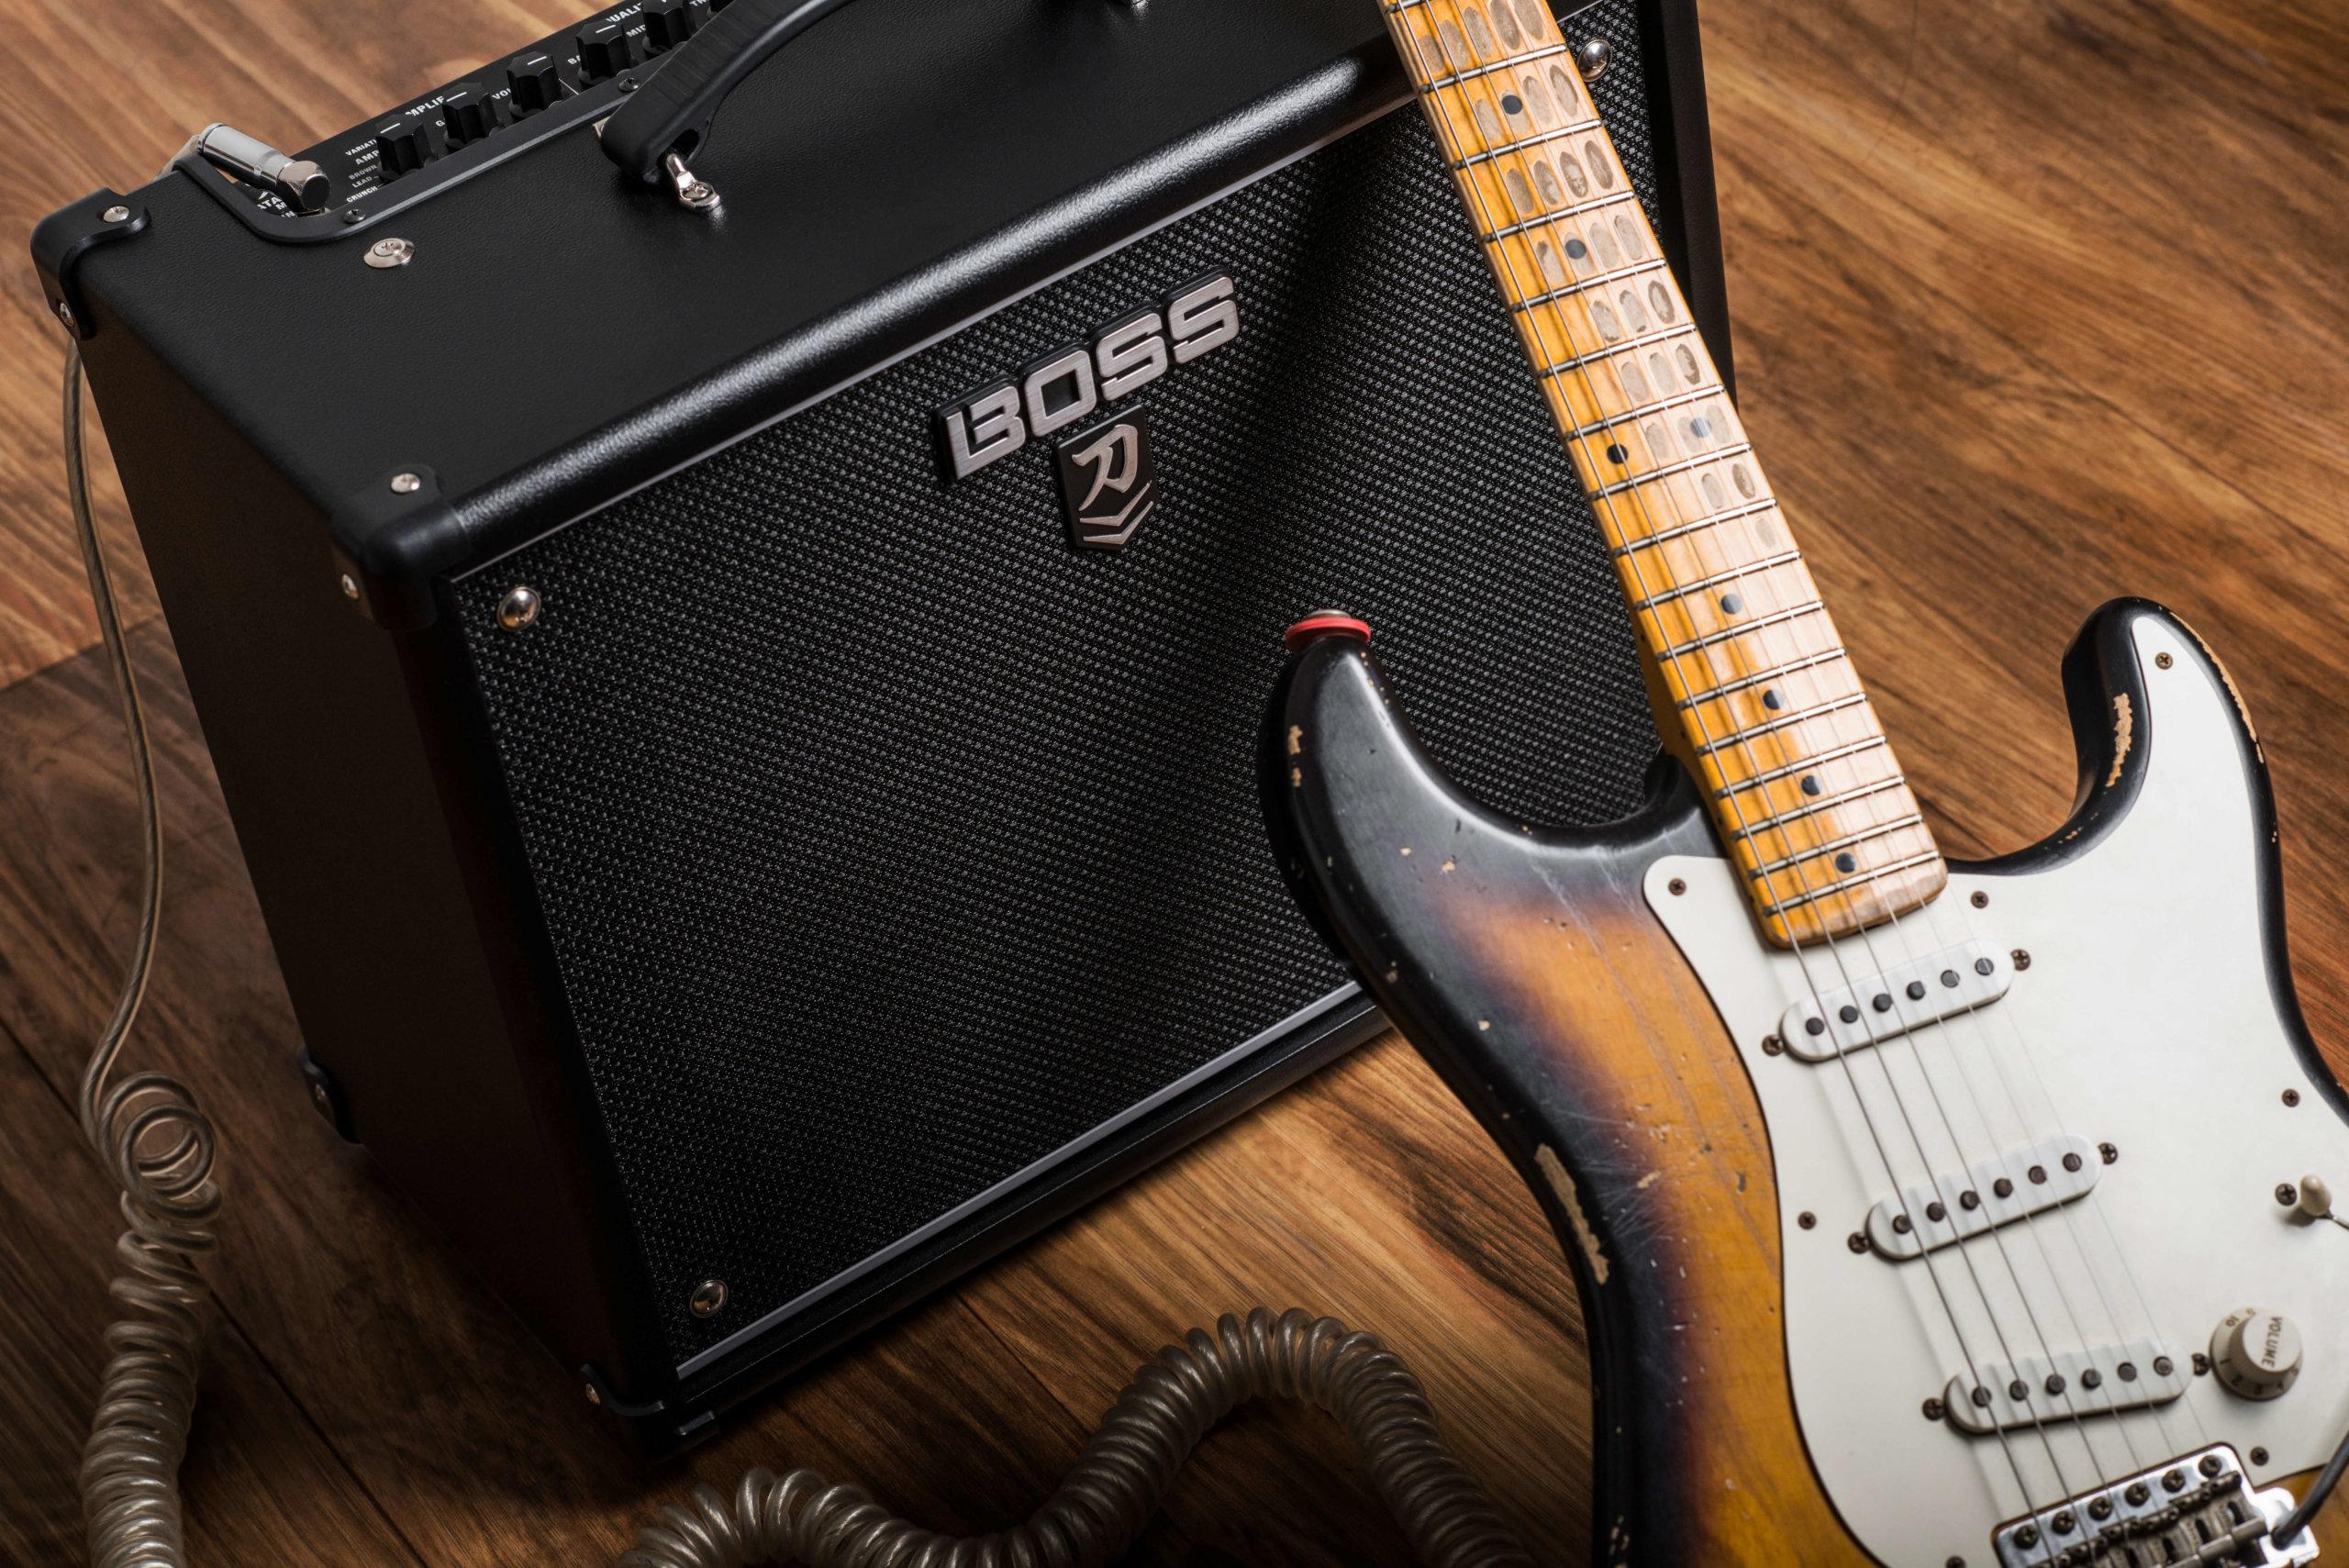 BOSS WAZA Speaker The Ultimate Rock Sound 100 watt Power Capacity Custom-Designed 12 Inch Guitar Speaker